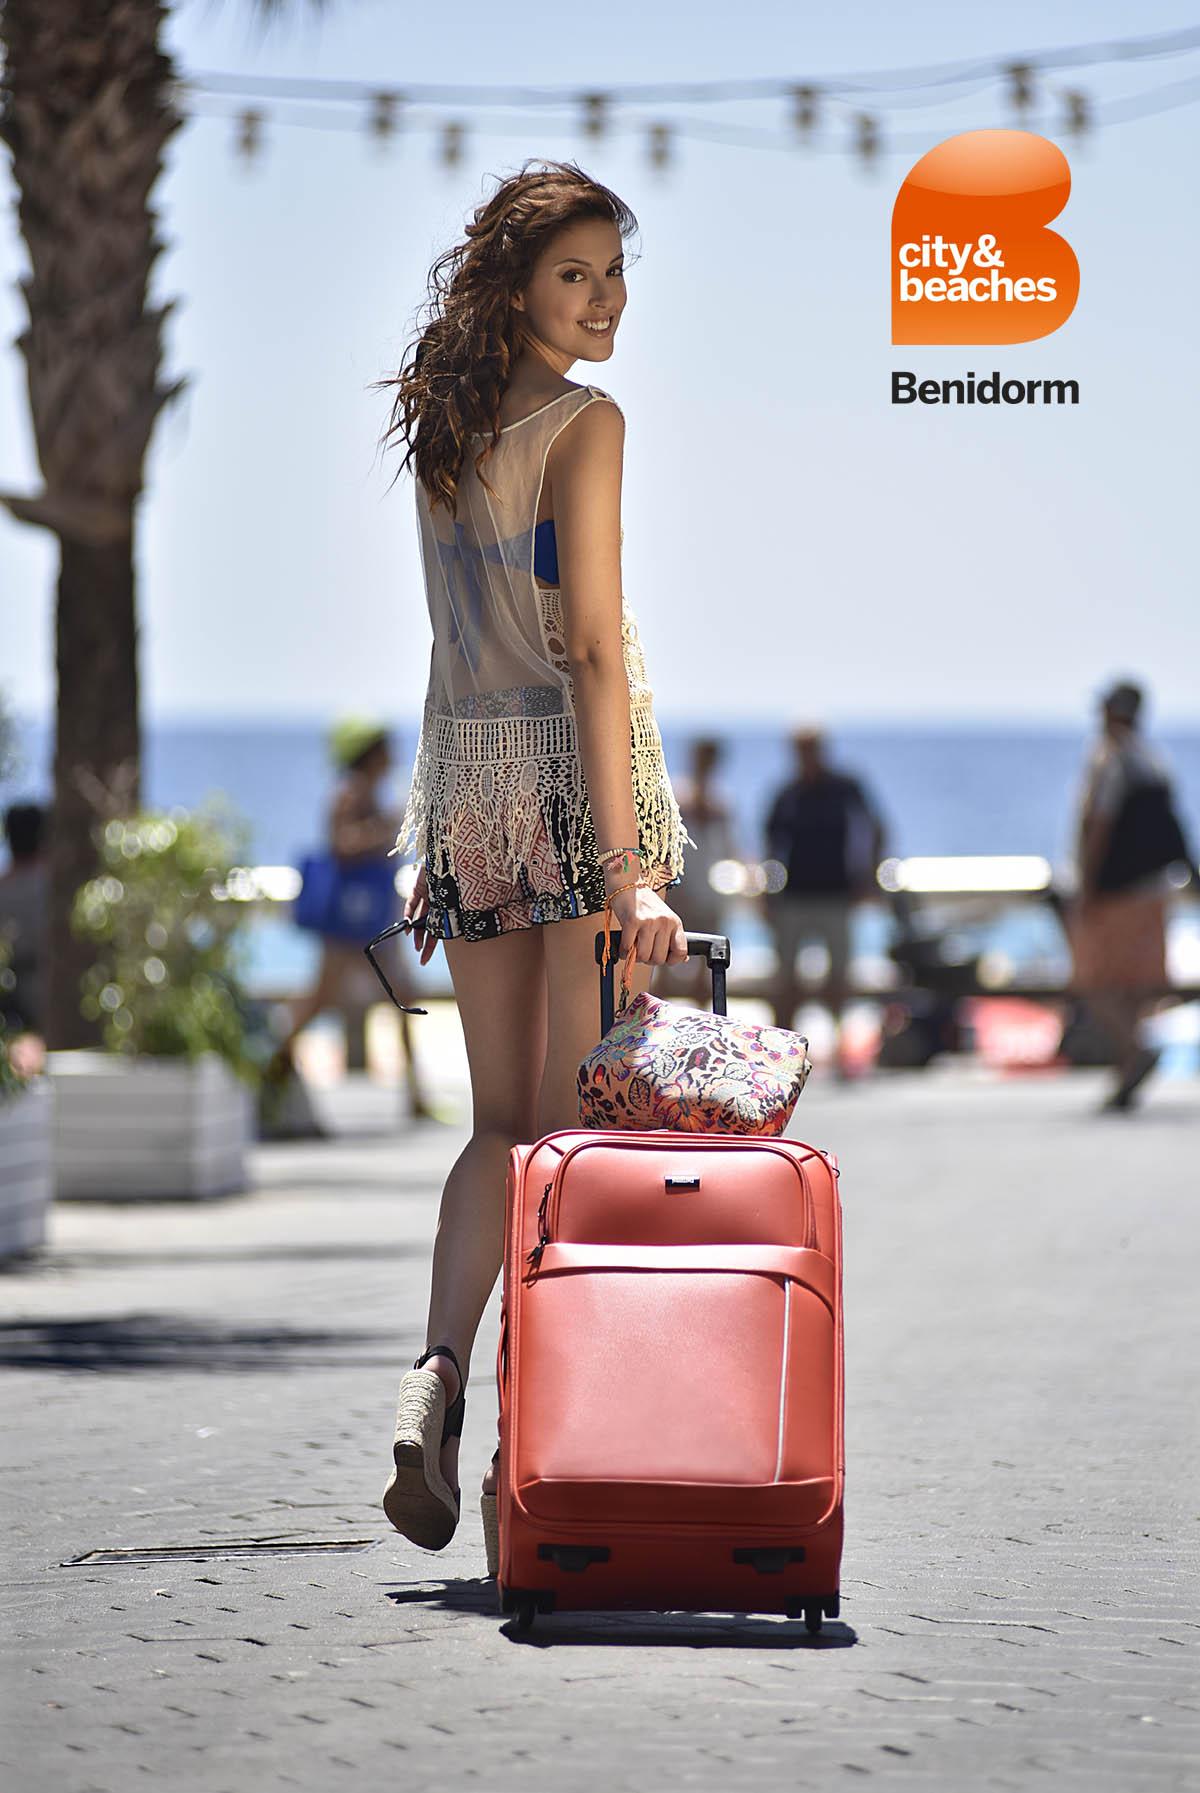 Benidorm_Maleta_02